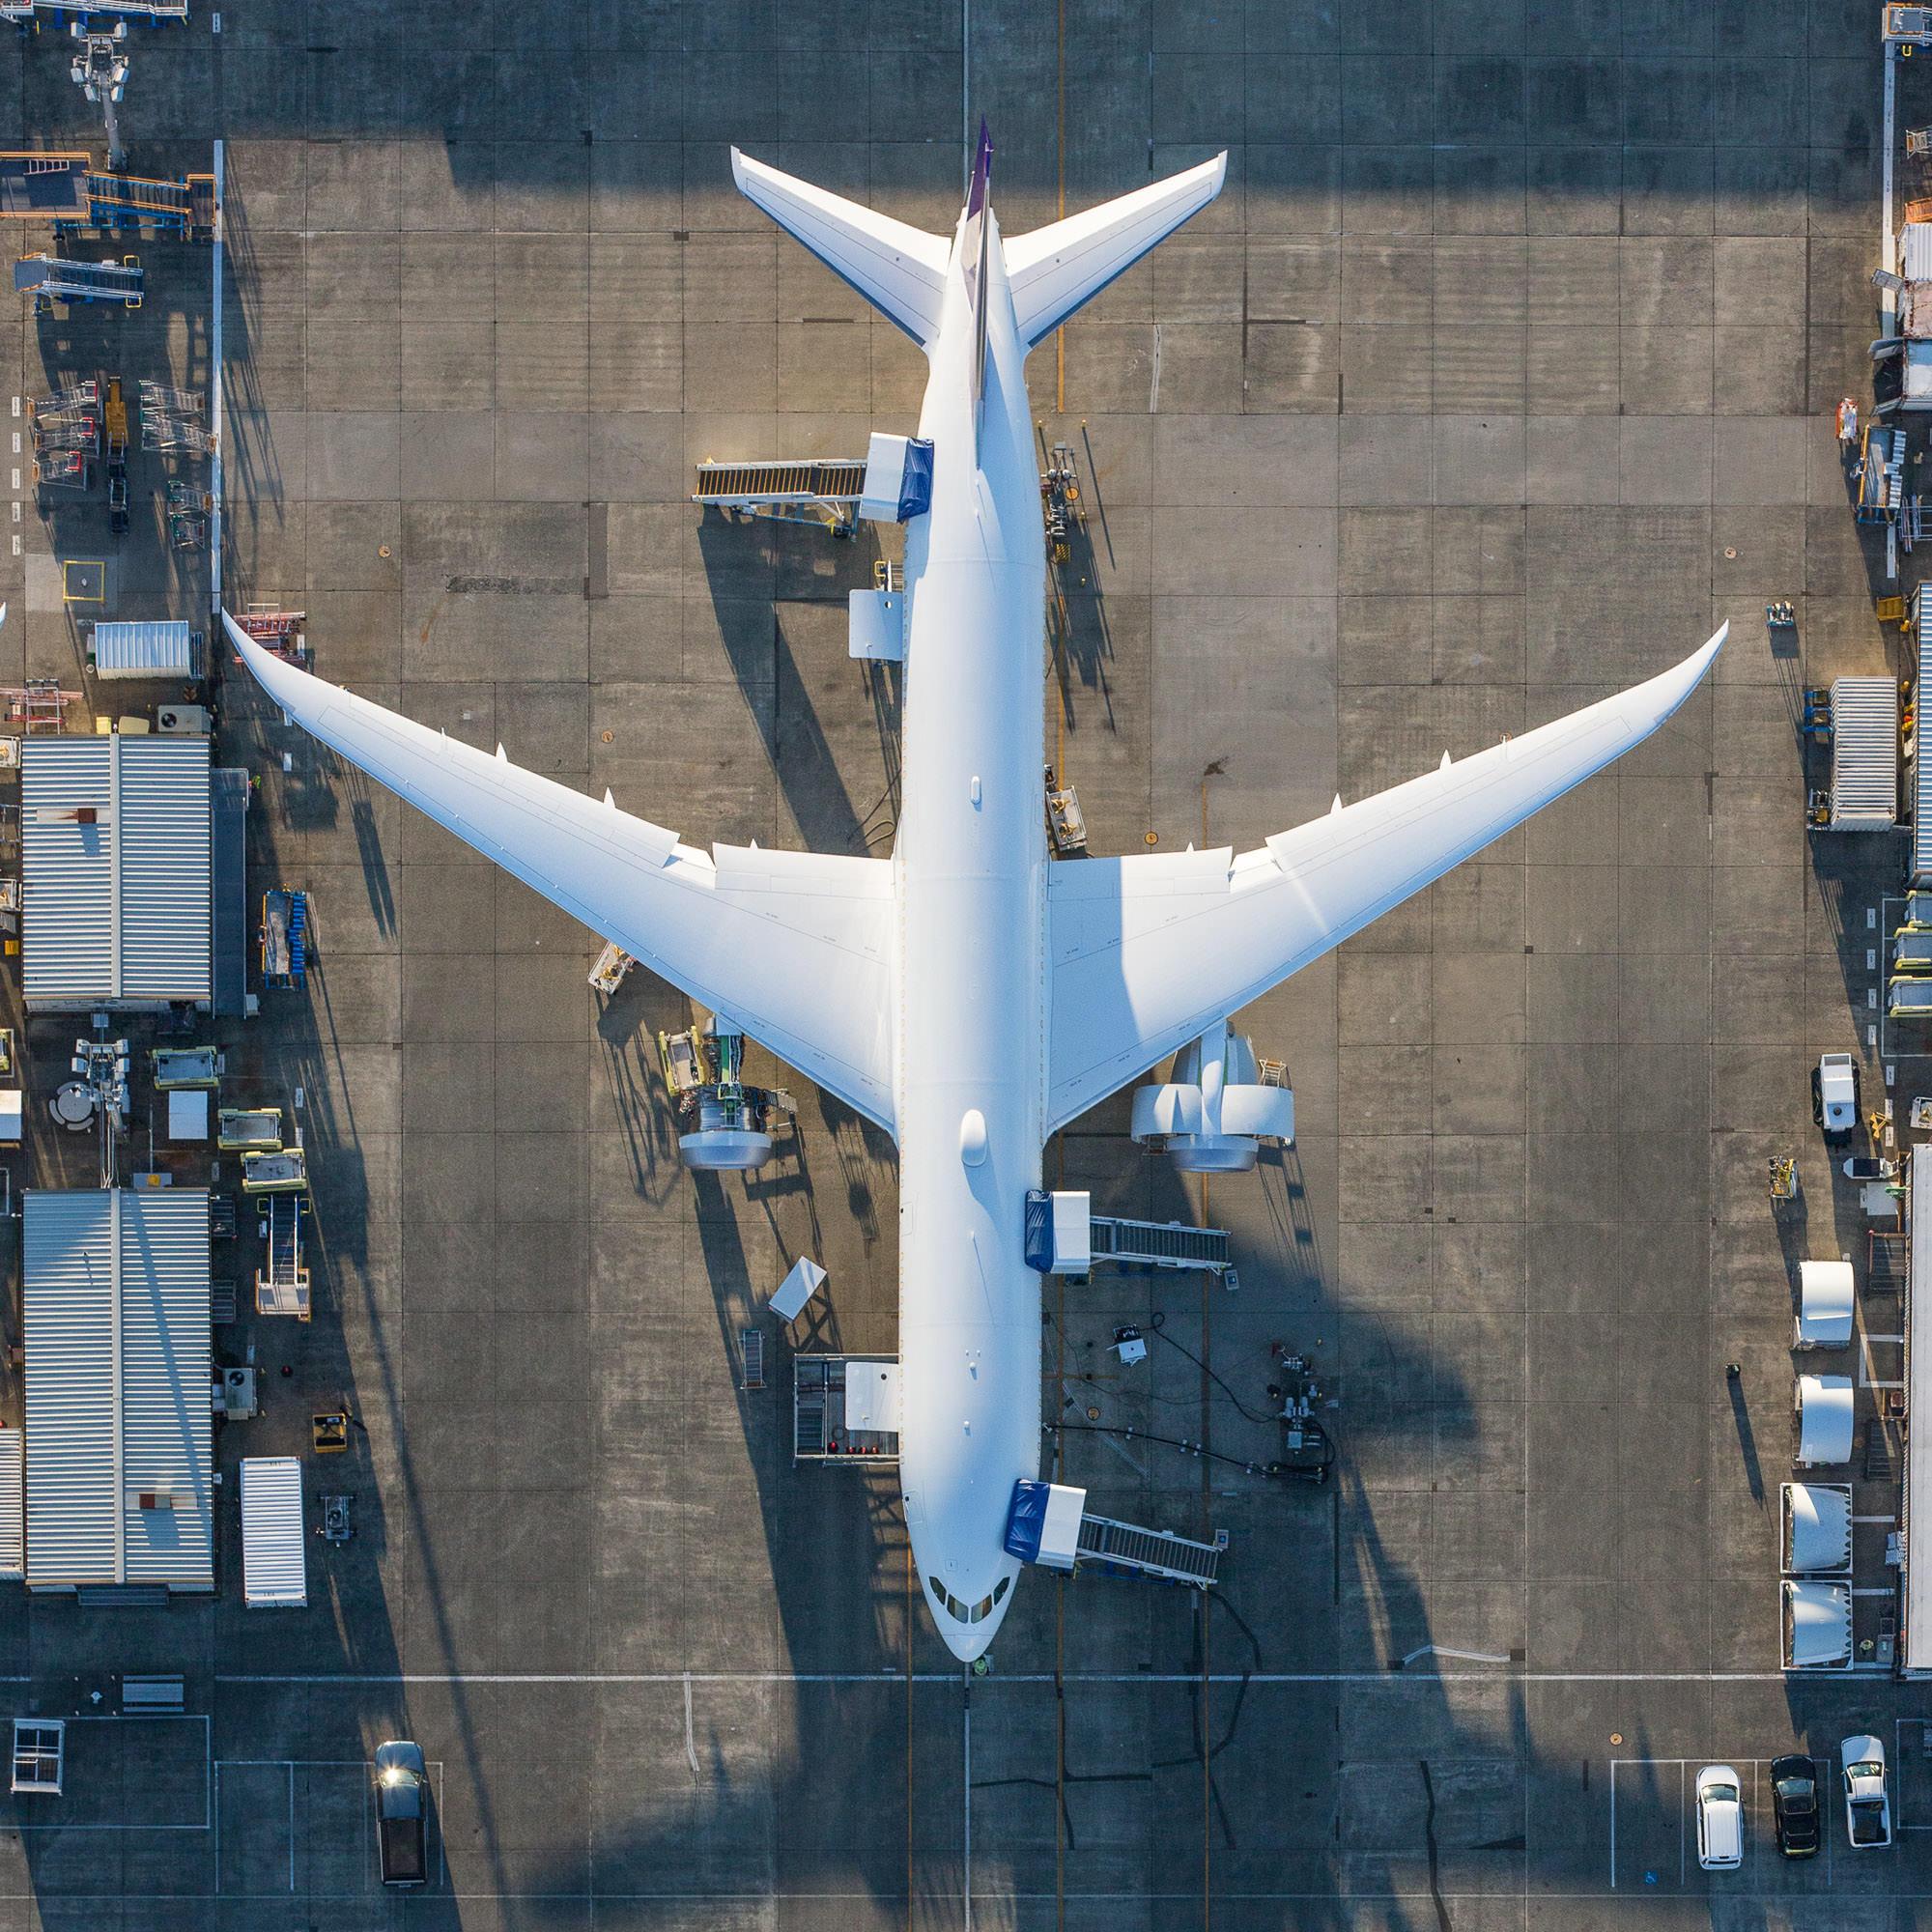 mike-kelley-life-cycles-aviation-1.jpg